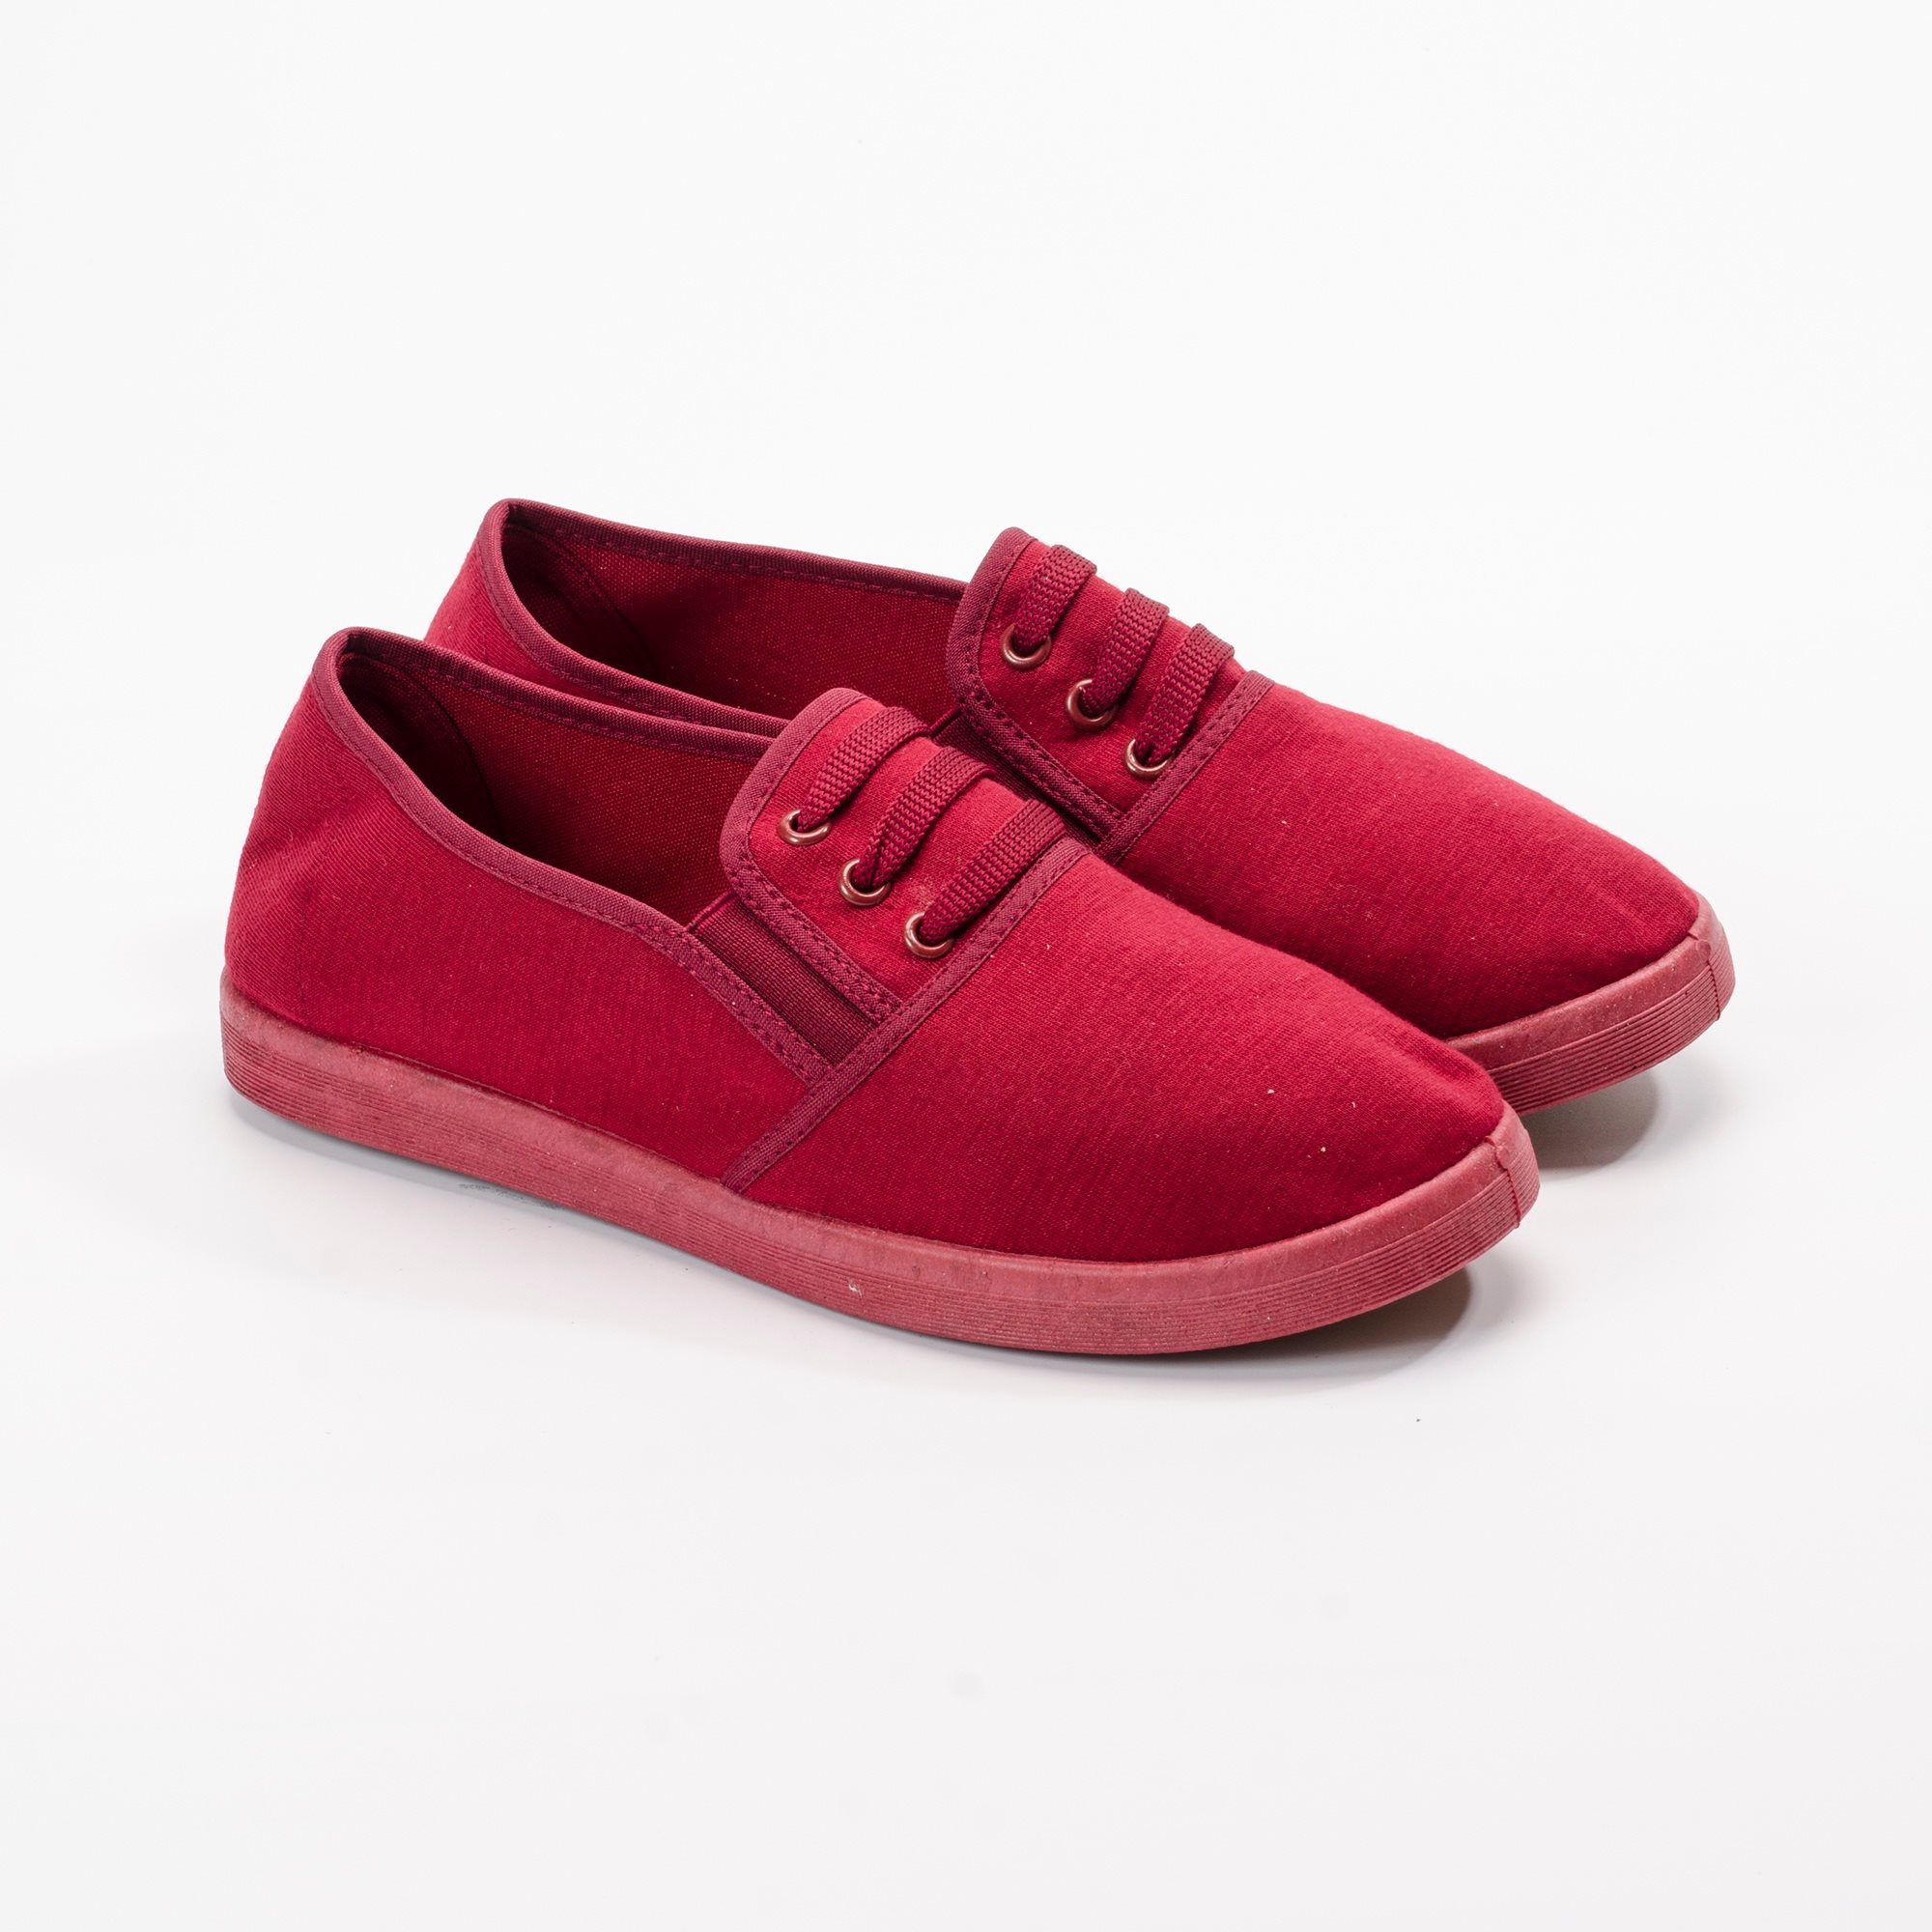 Giày Slipon nữ  MWC NUSL- 1511 - ĐỎ